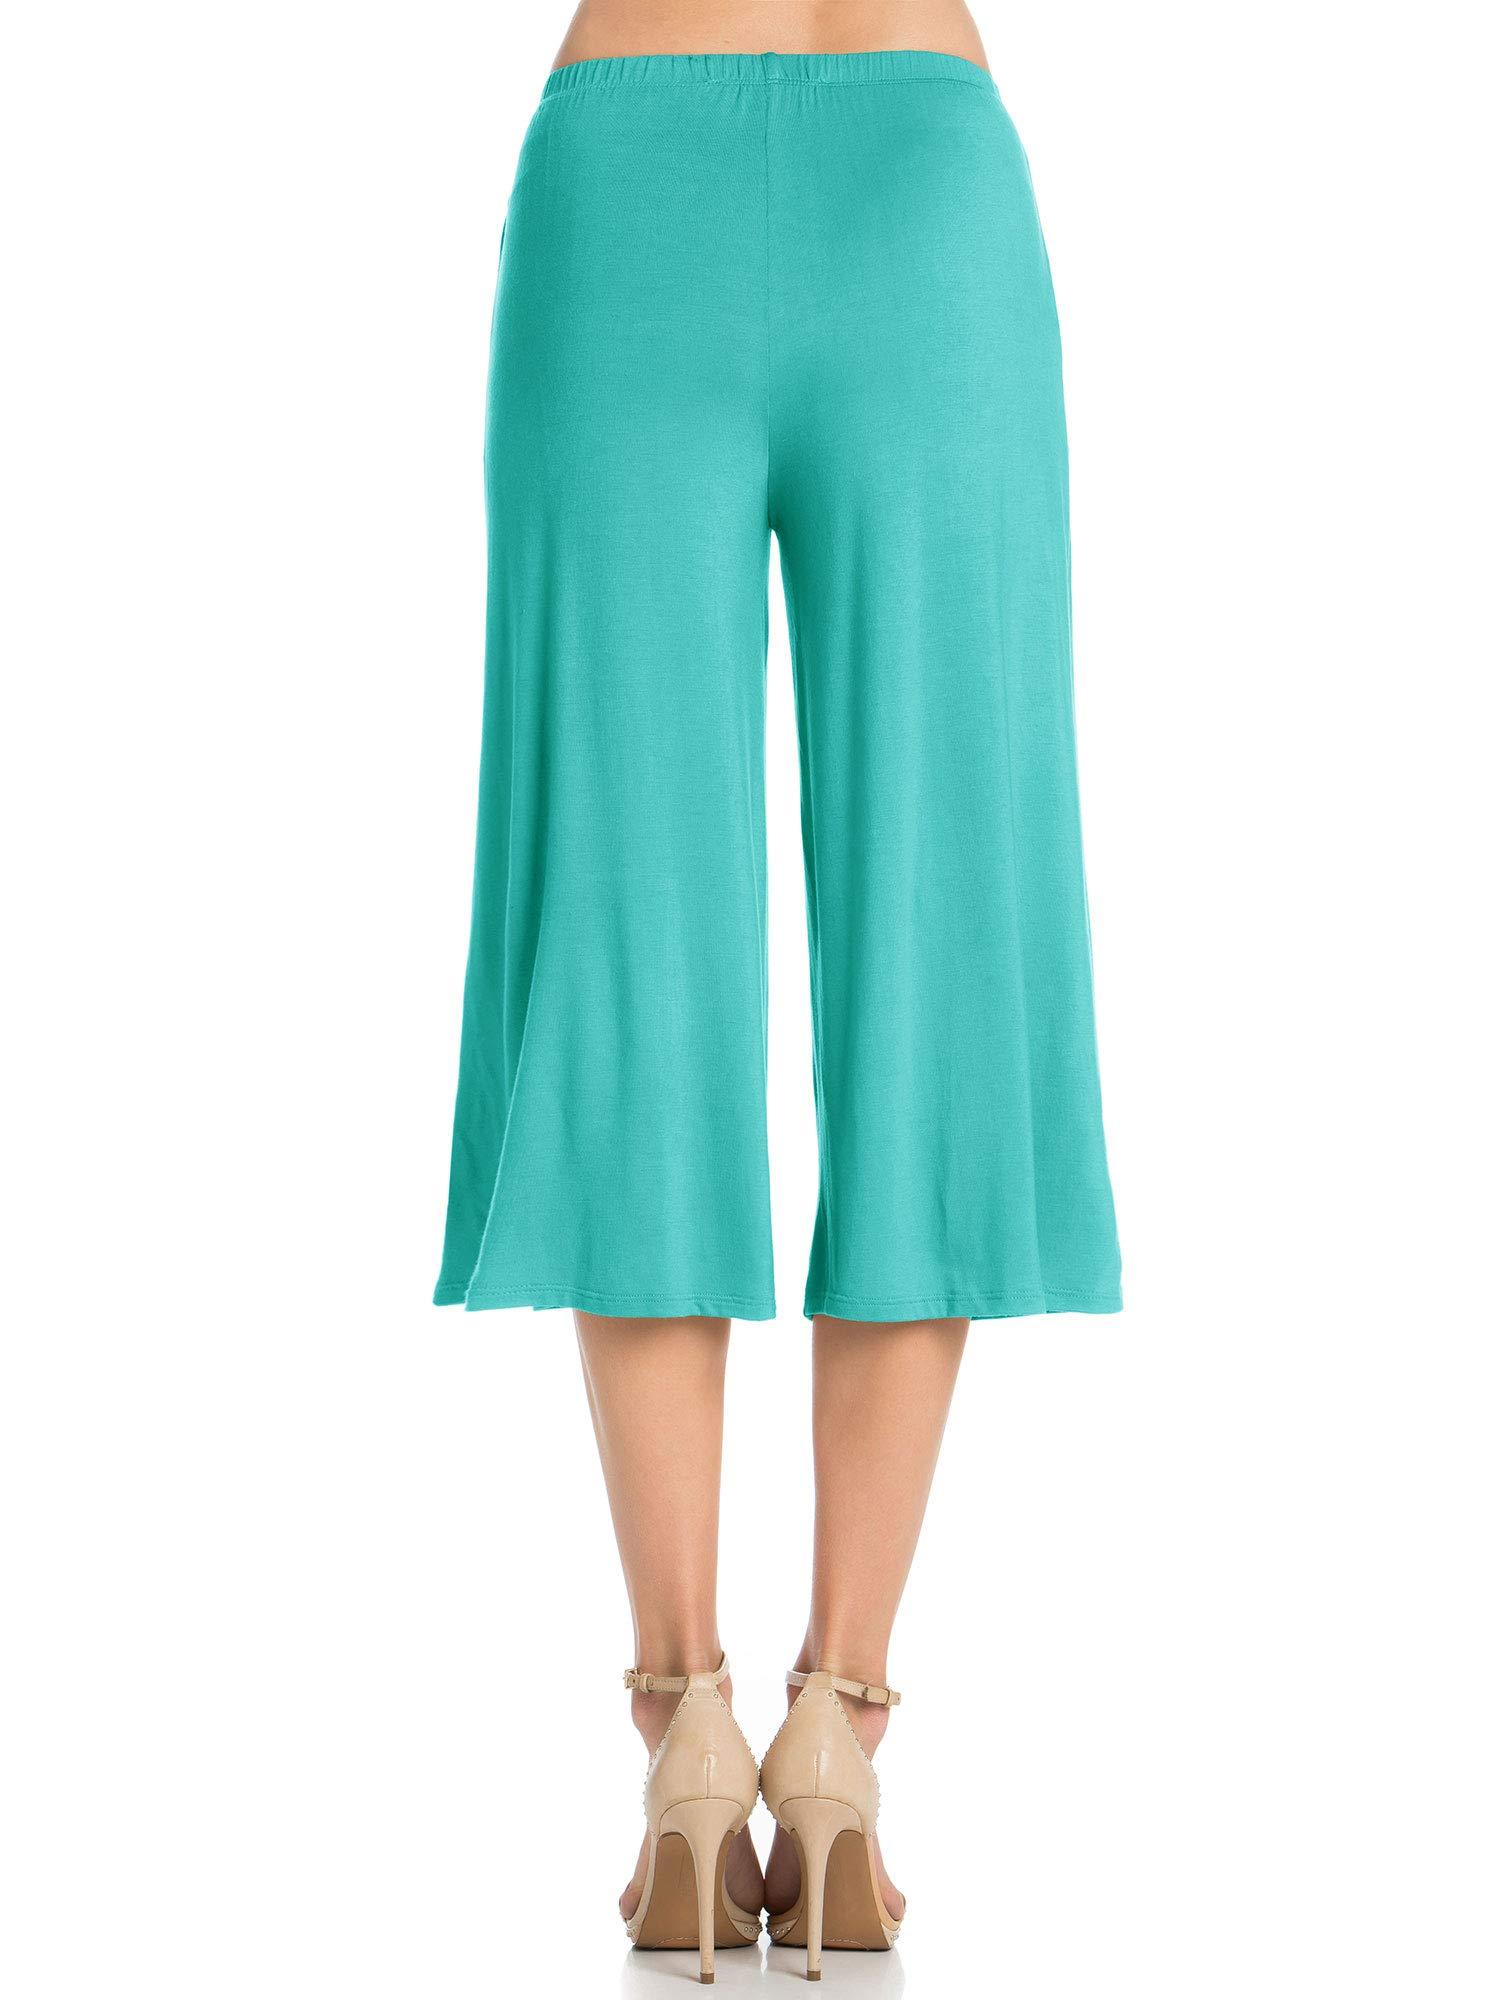 Fashion California Womens 1 Pack Elastic Waist Jersey Culottes Capri Pocket Pants (XXXXX-Large, Aqua) by Fashion California (Image #5)